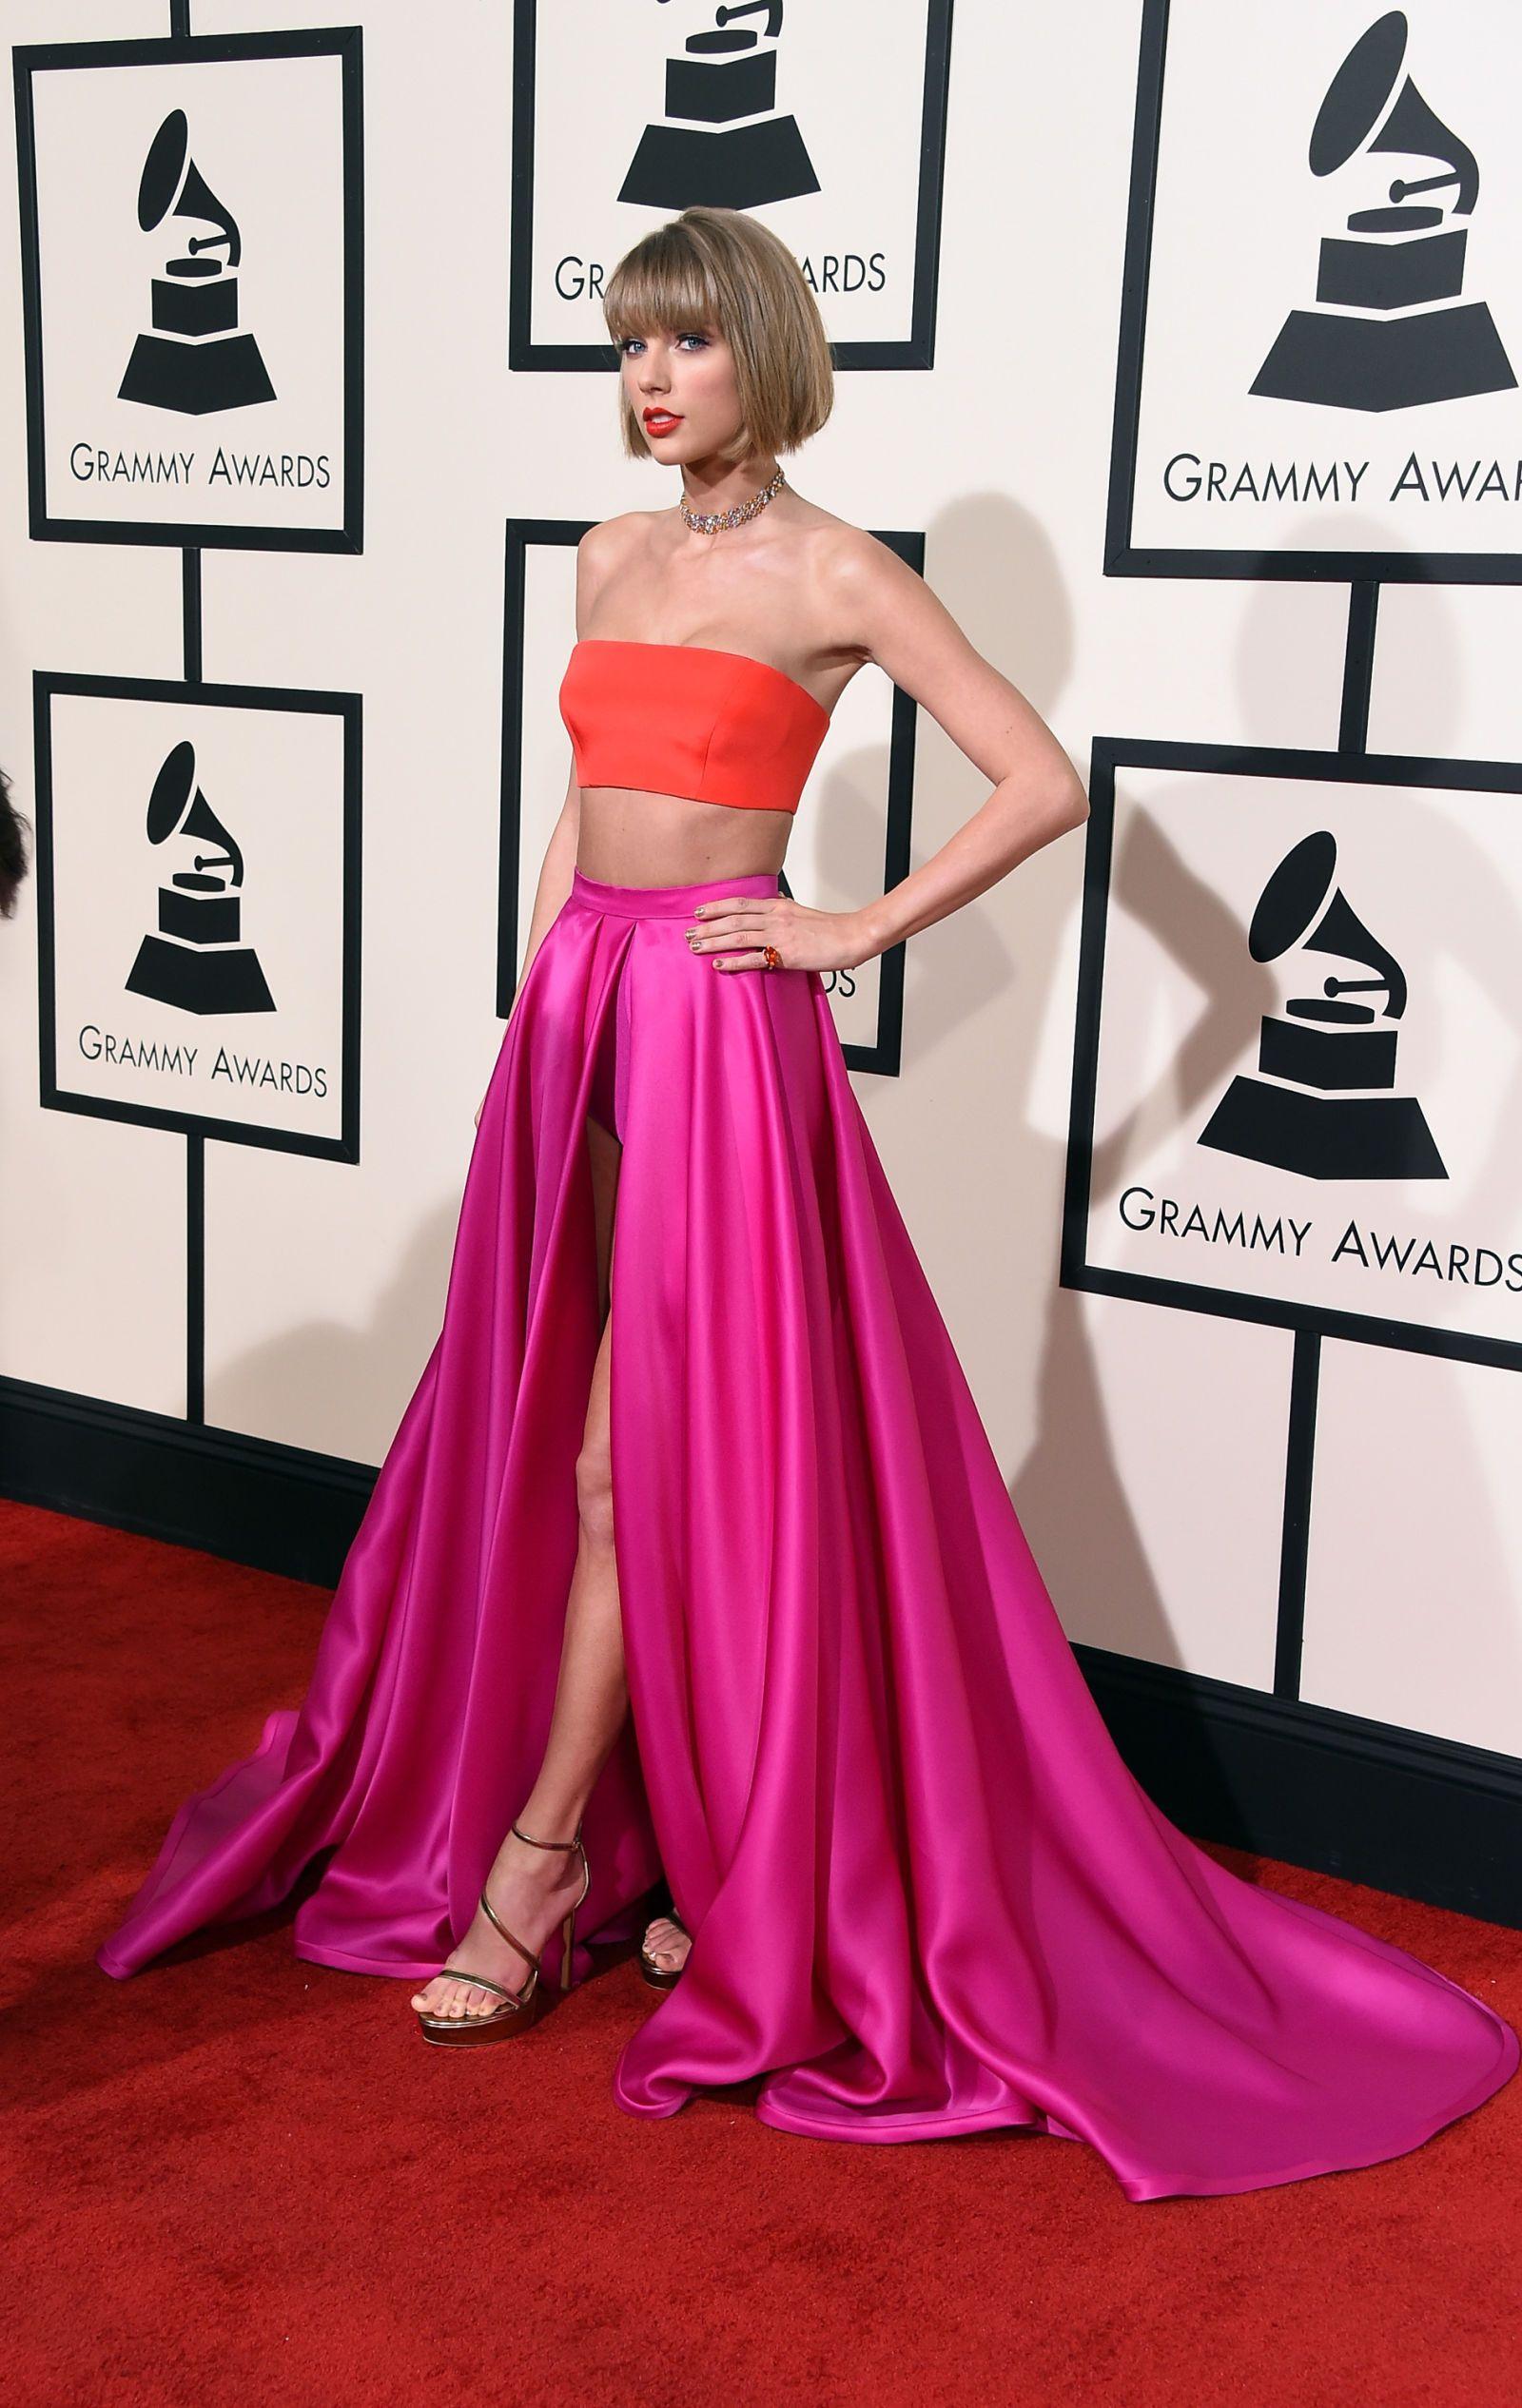 The Best Red Carpet Looks from the 2016 Grammys | Trajes de fiesta ...